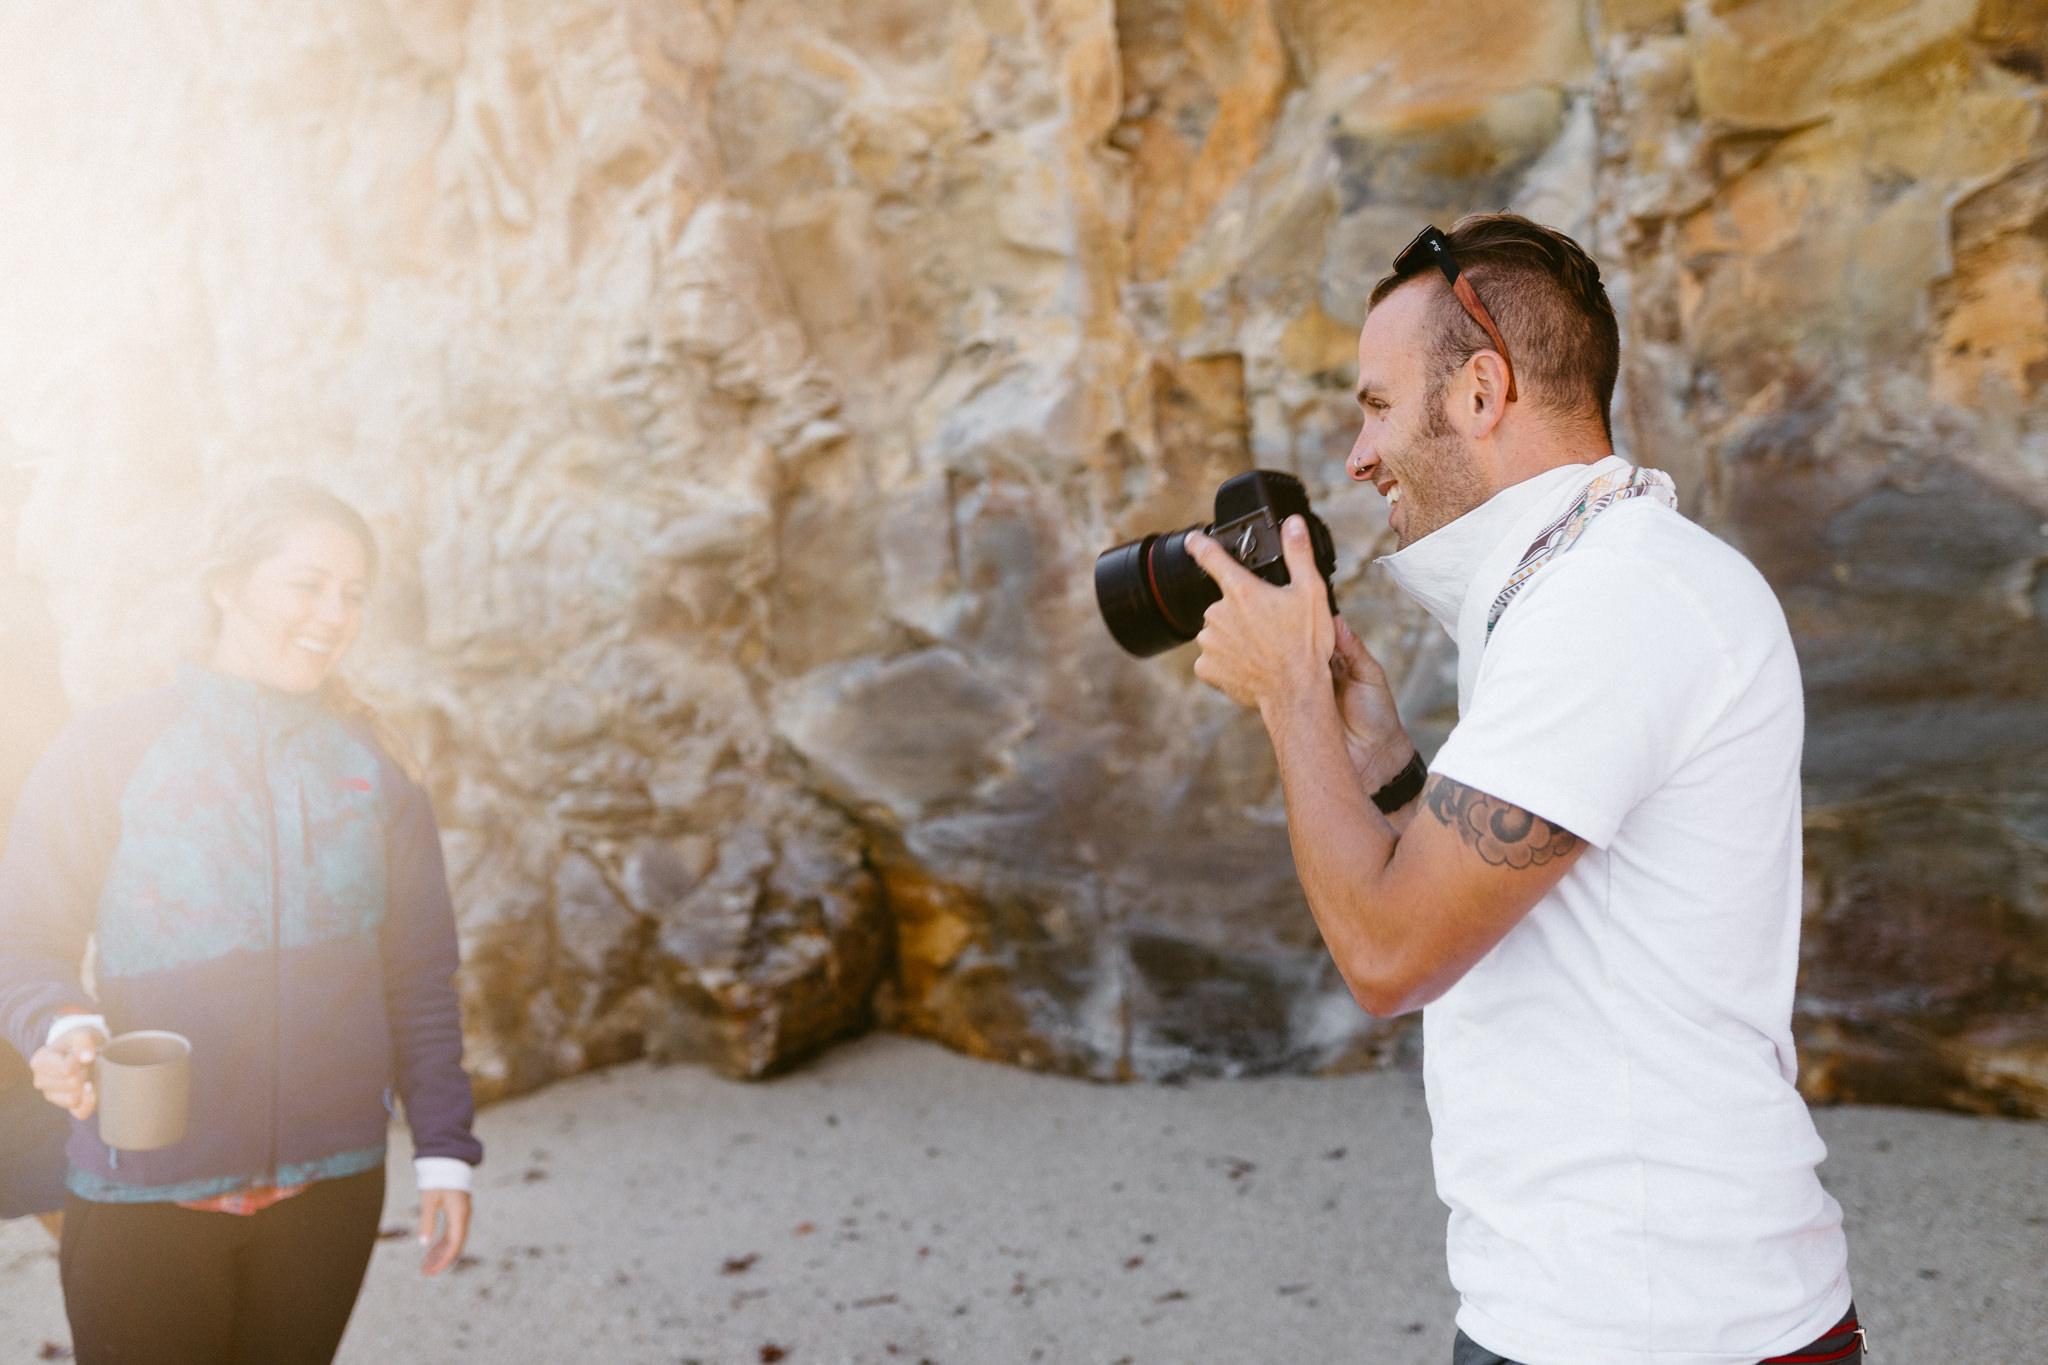 adventure photographer gear